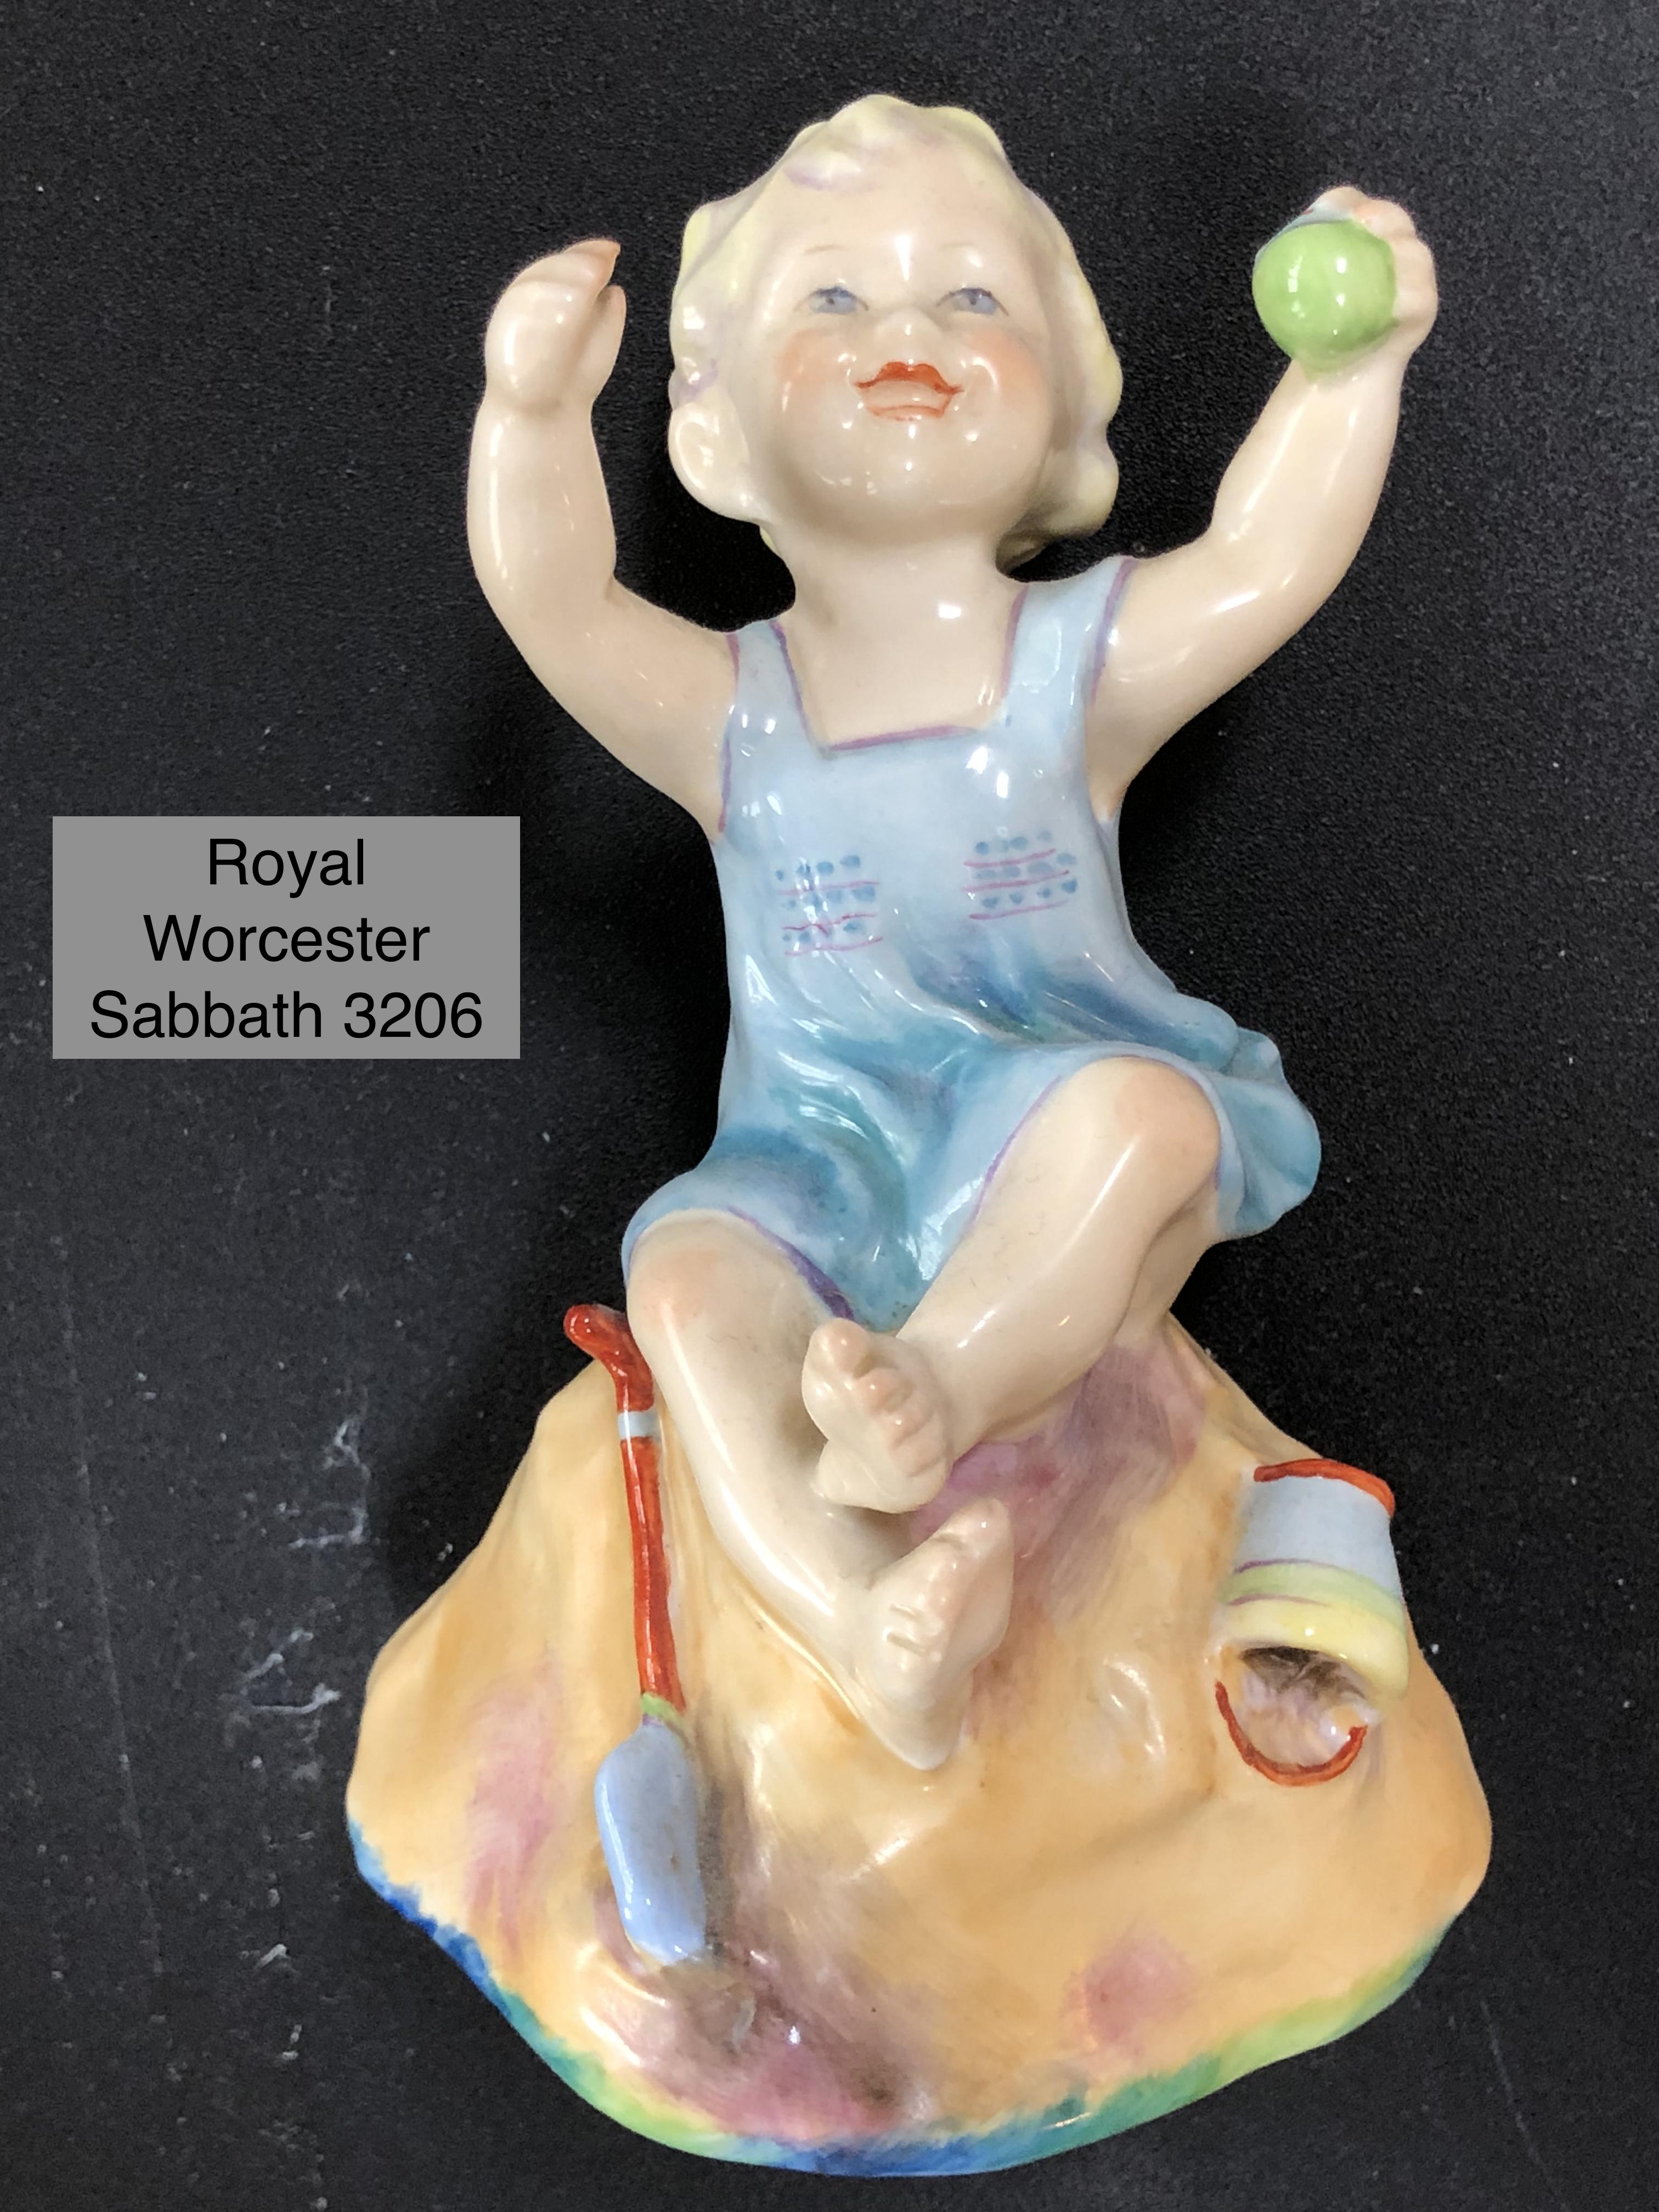 Royal Worcester Sabbath 3206